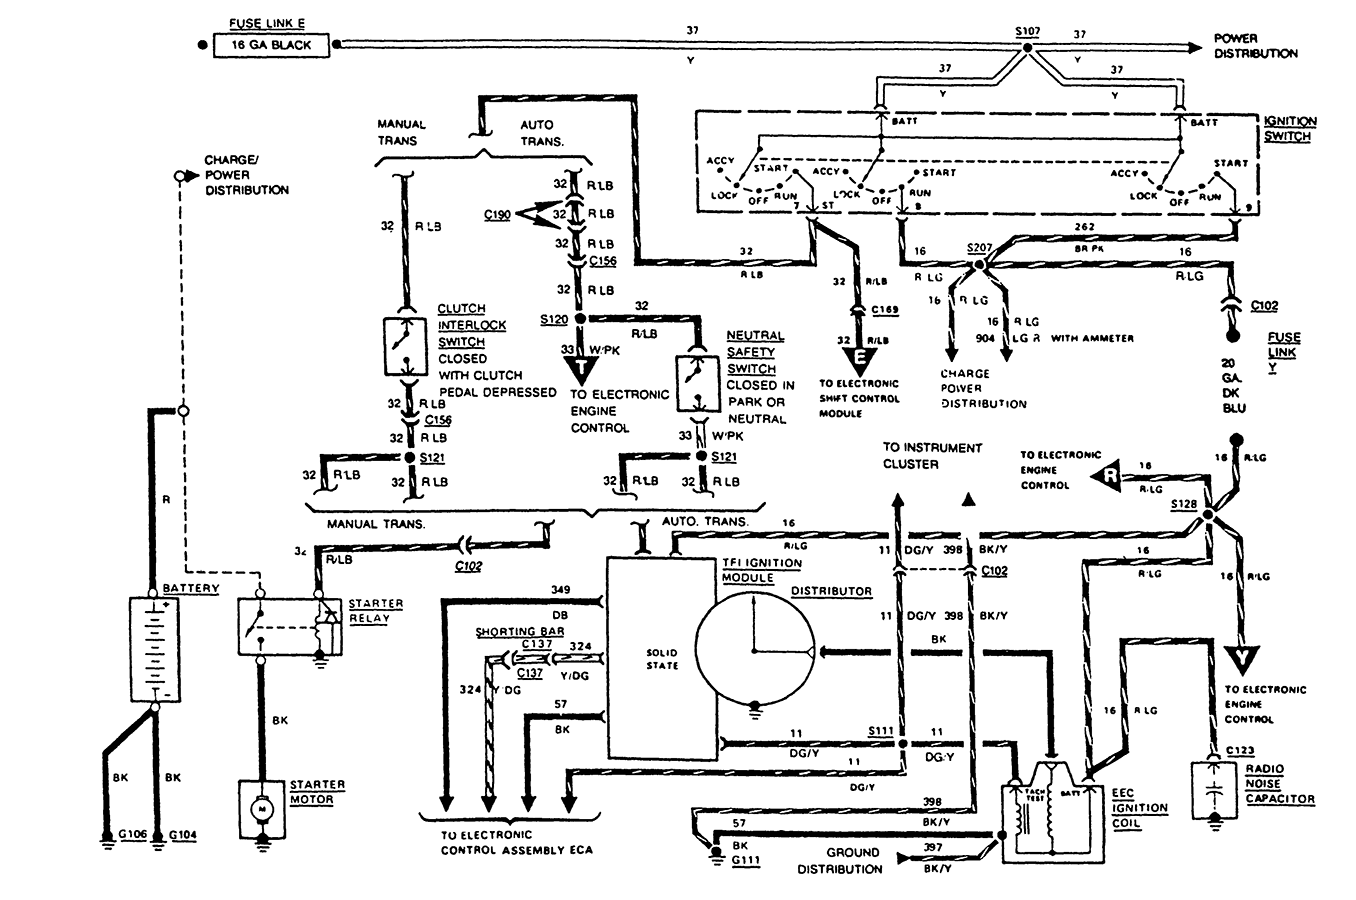 e29d5c39-90cb-4869-ba87-d287d4cad8cf_ignition circuit.png